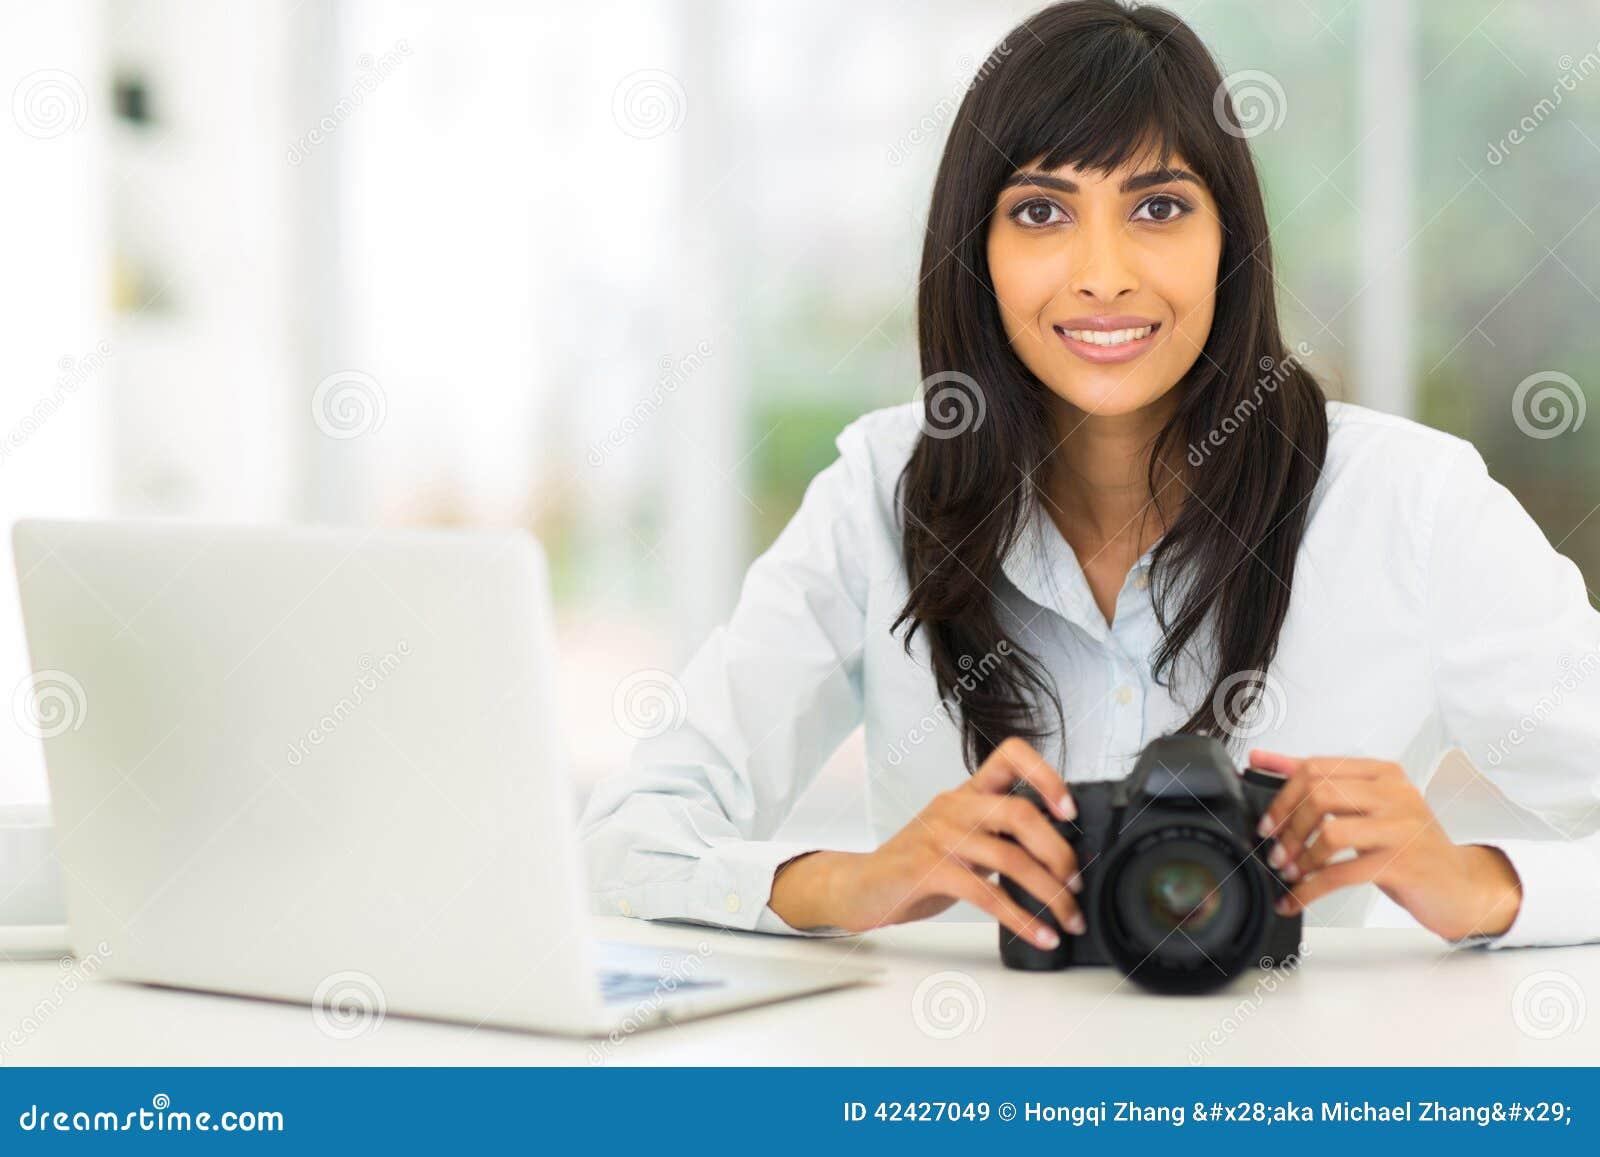 Fotógrafo indio de sexo femenino